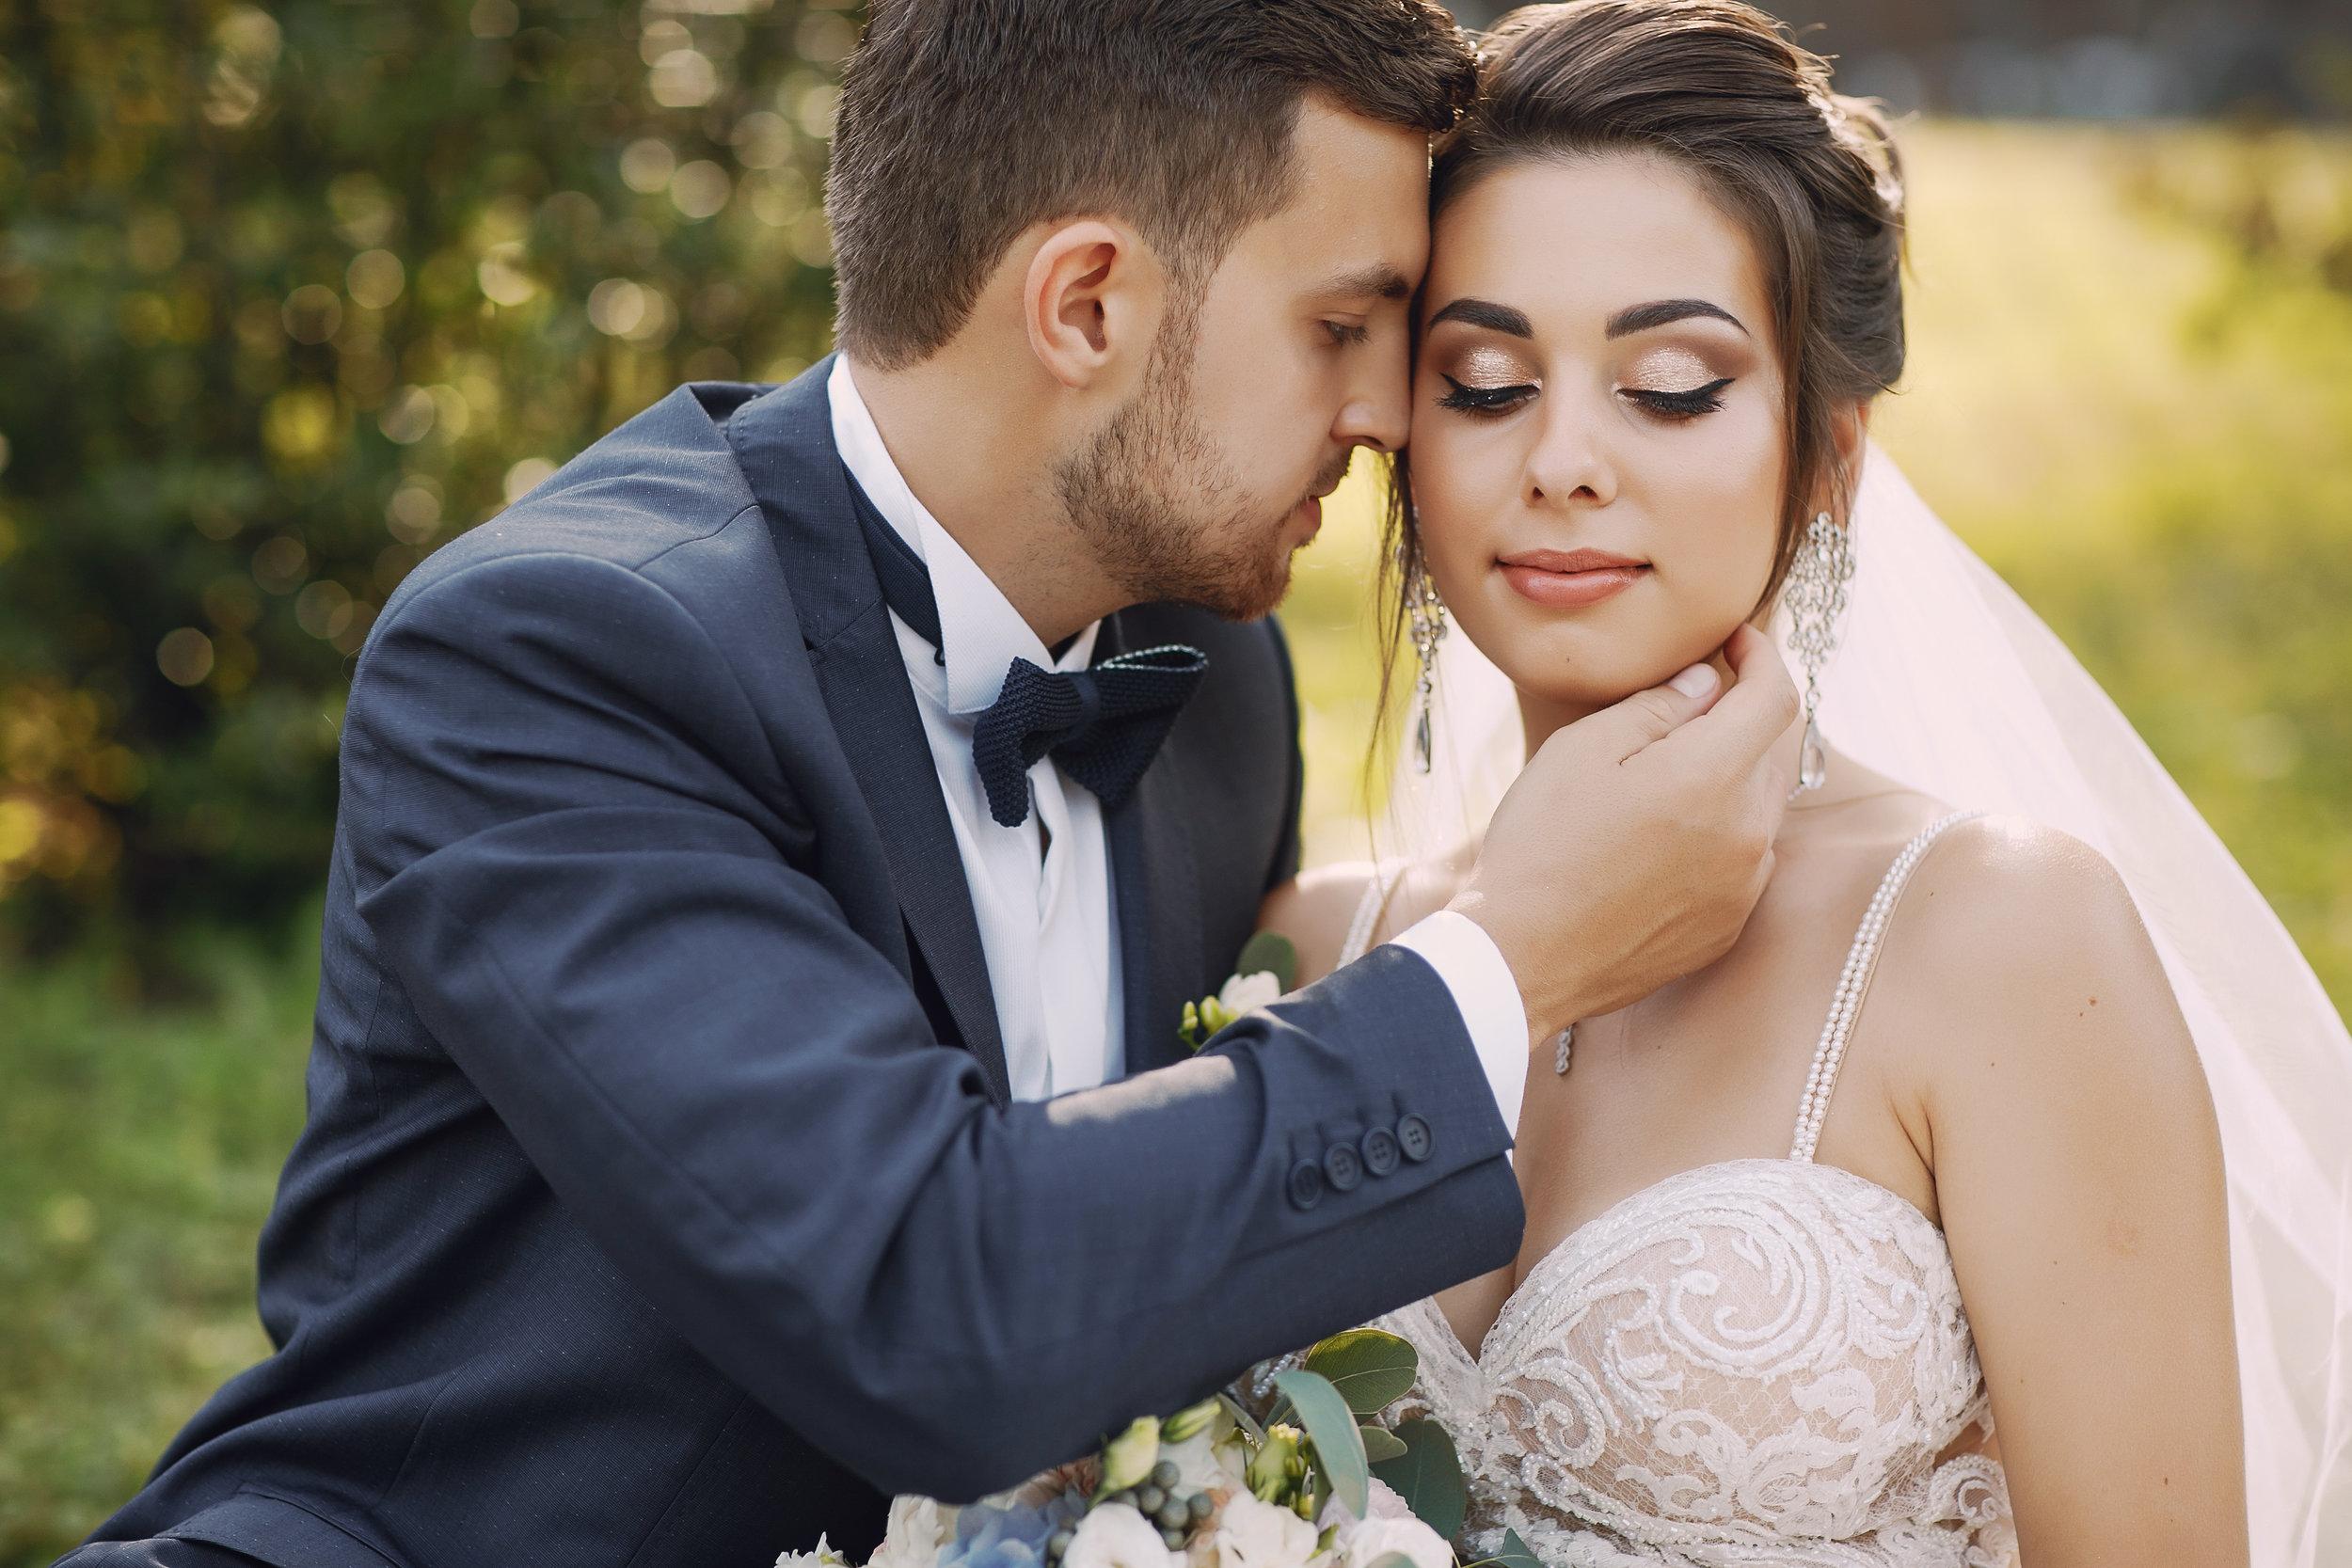 wedding-couple-9PHFX4B.jpg